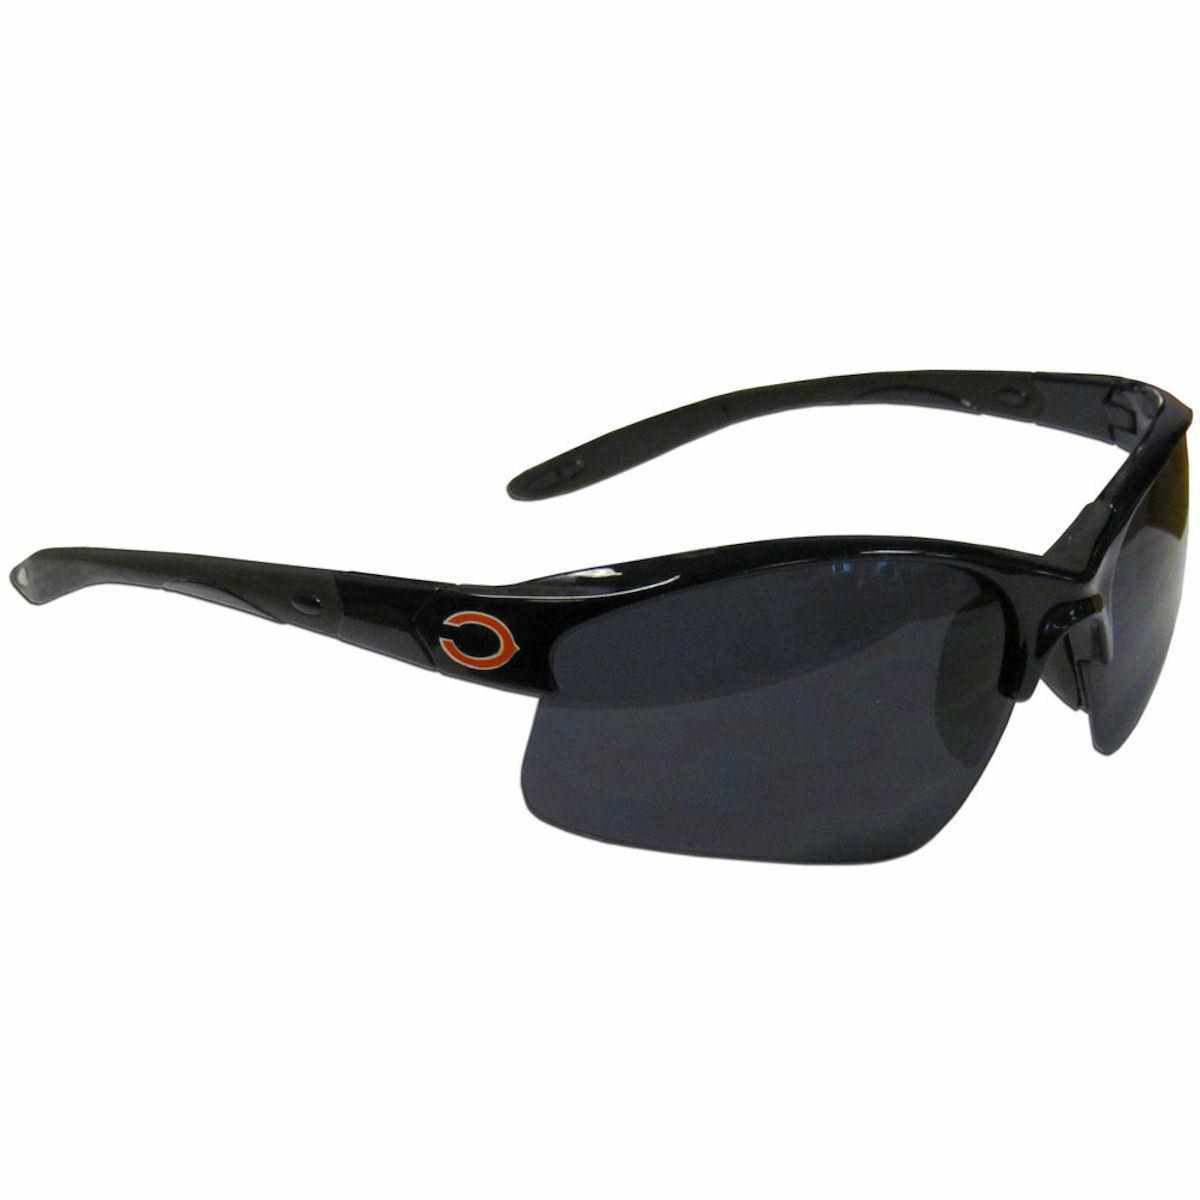 blade wing sunglasses PICK TEAM